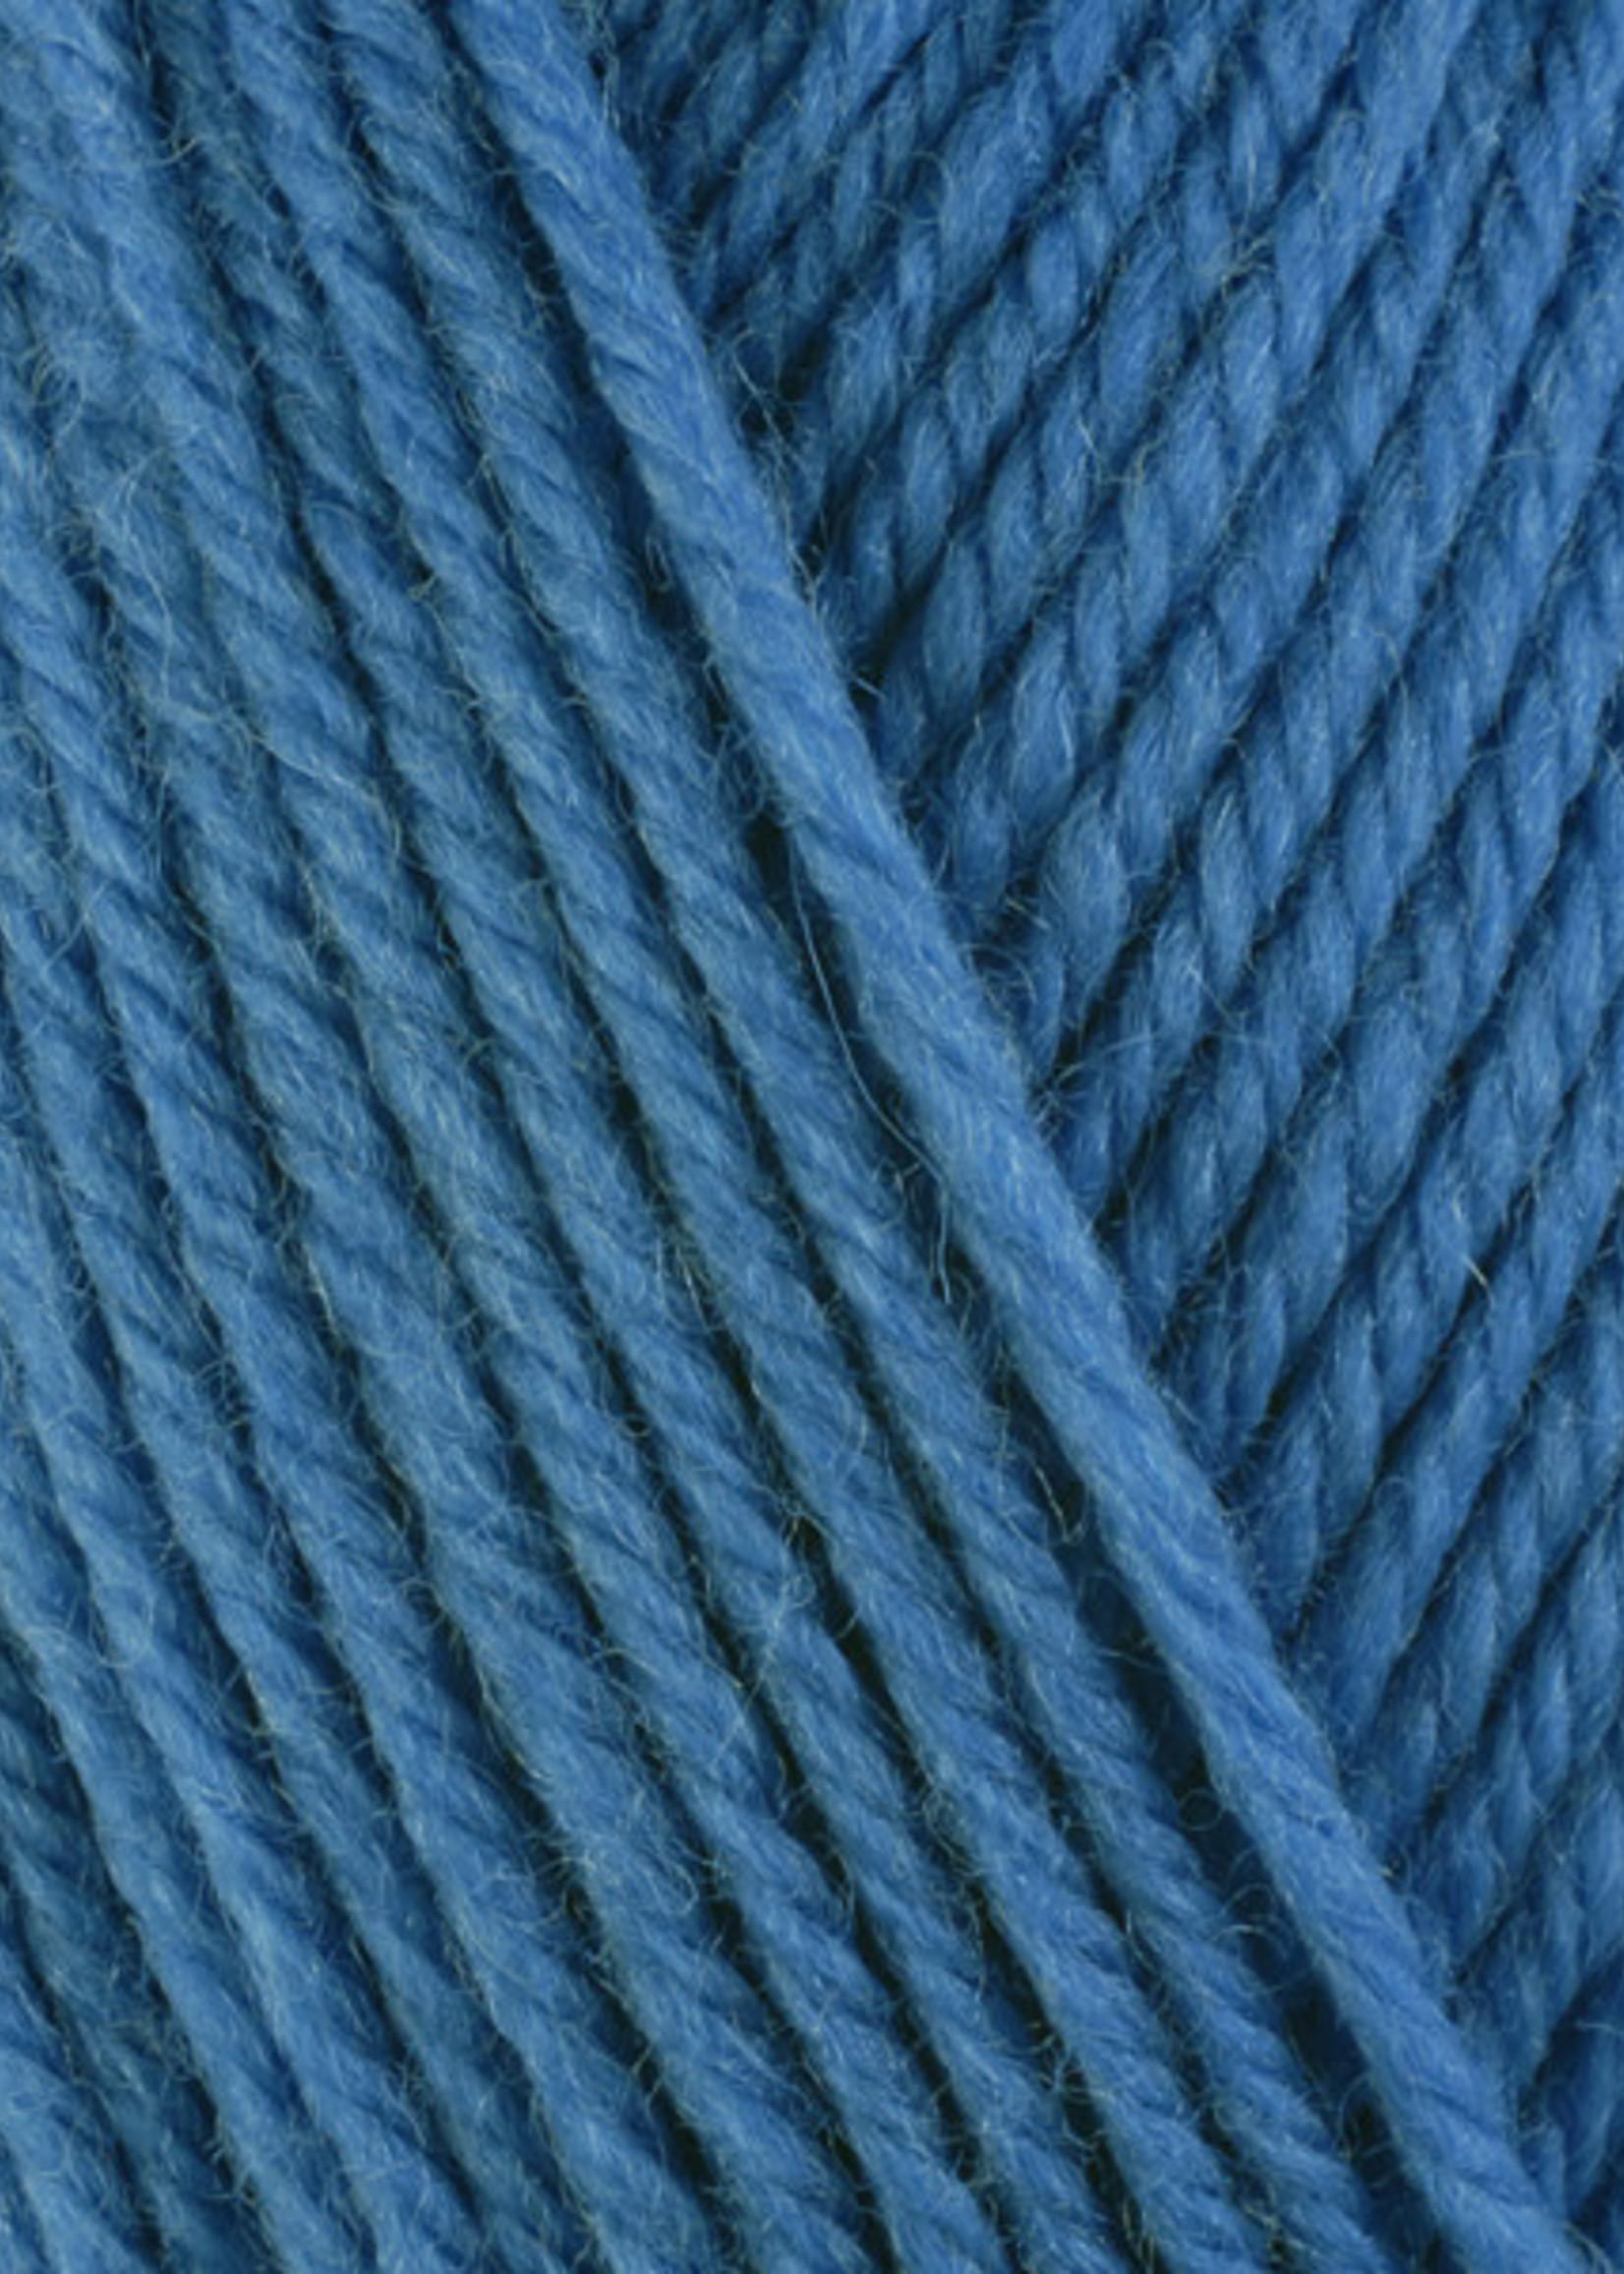 Berroco Berroco Ultra Wool 3326 River